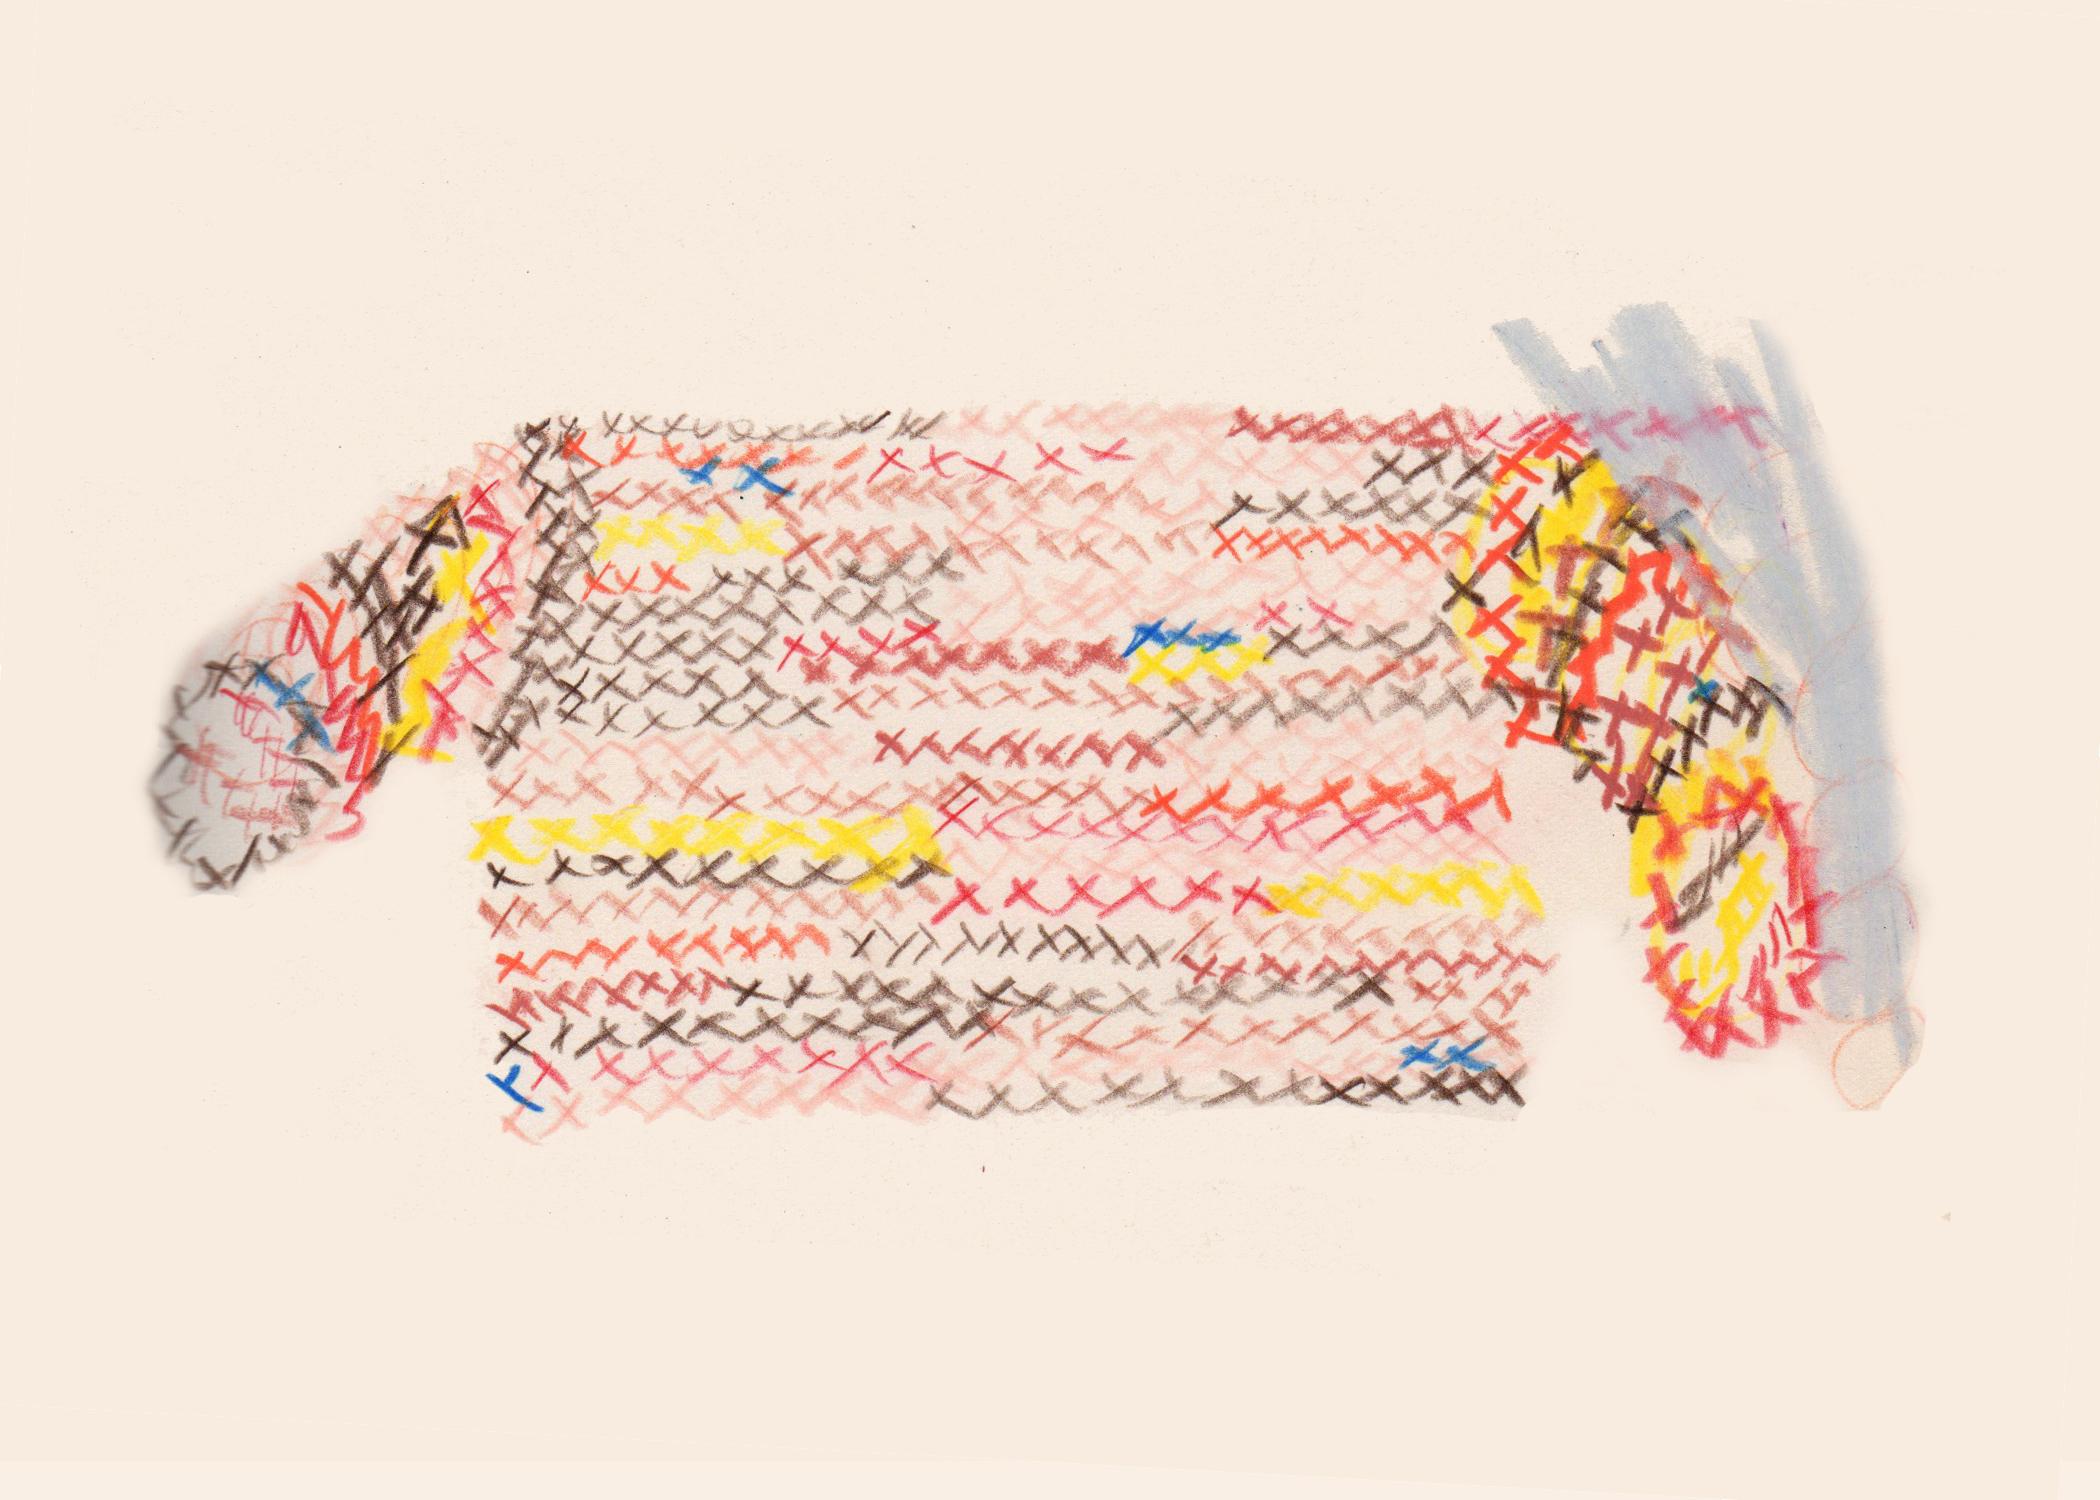 Eckhaus Latta x Whitney Sweater Illustration